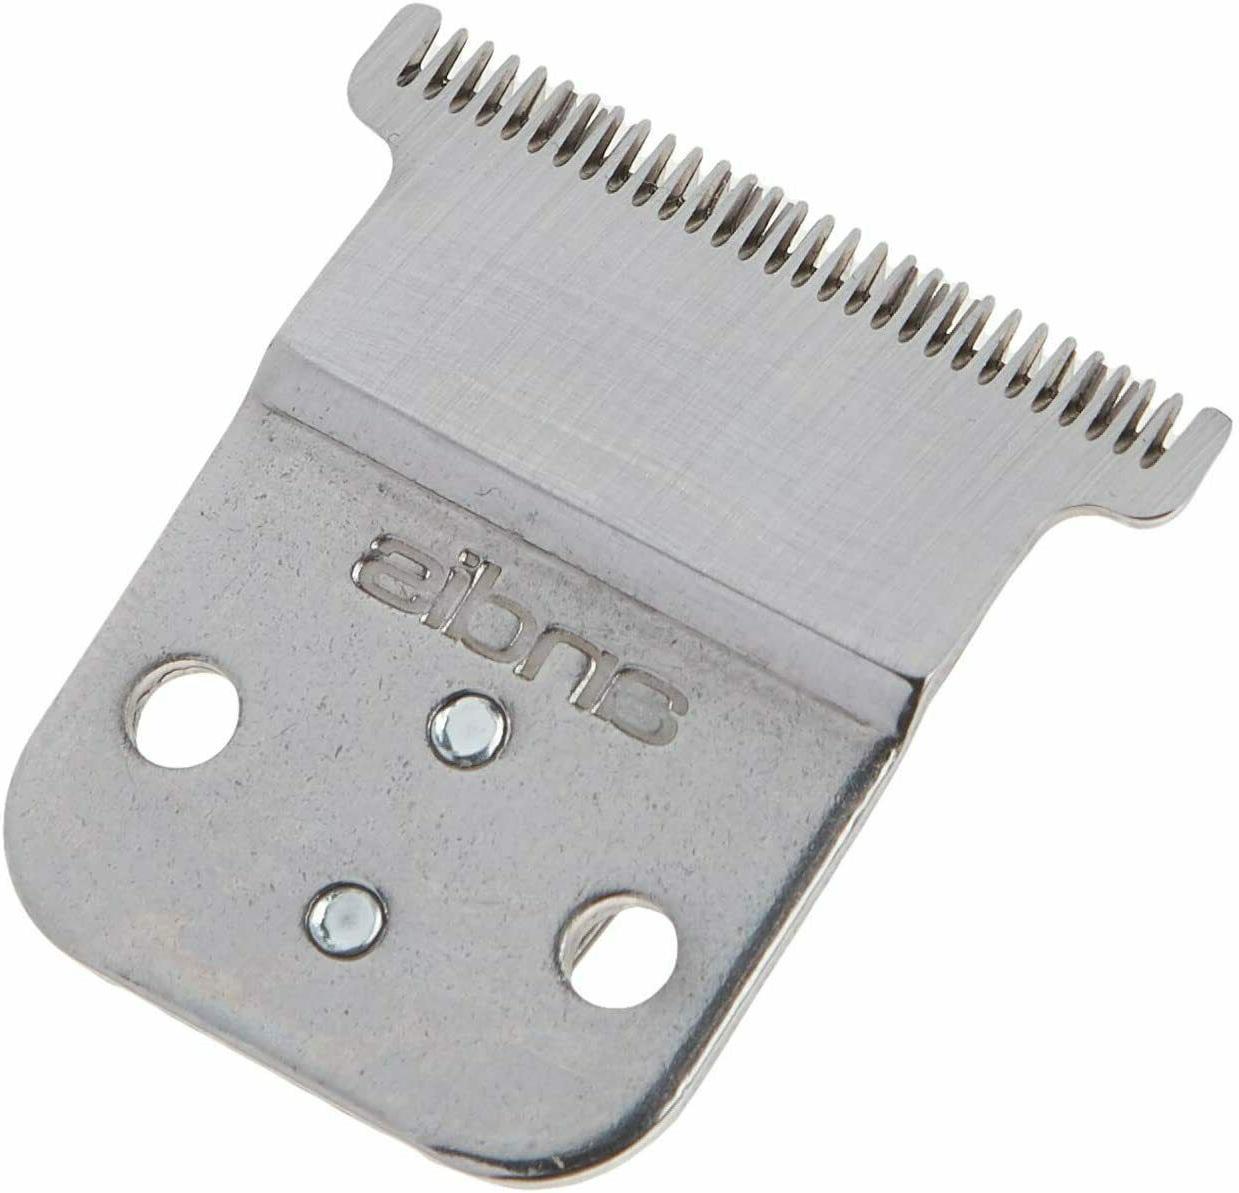 Andis Slimline Li Replacement Comfort Blade #32105